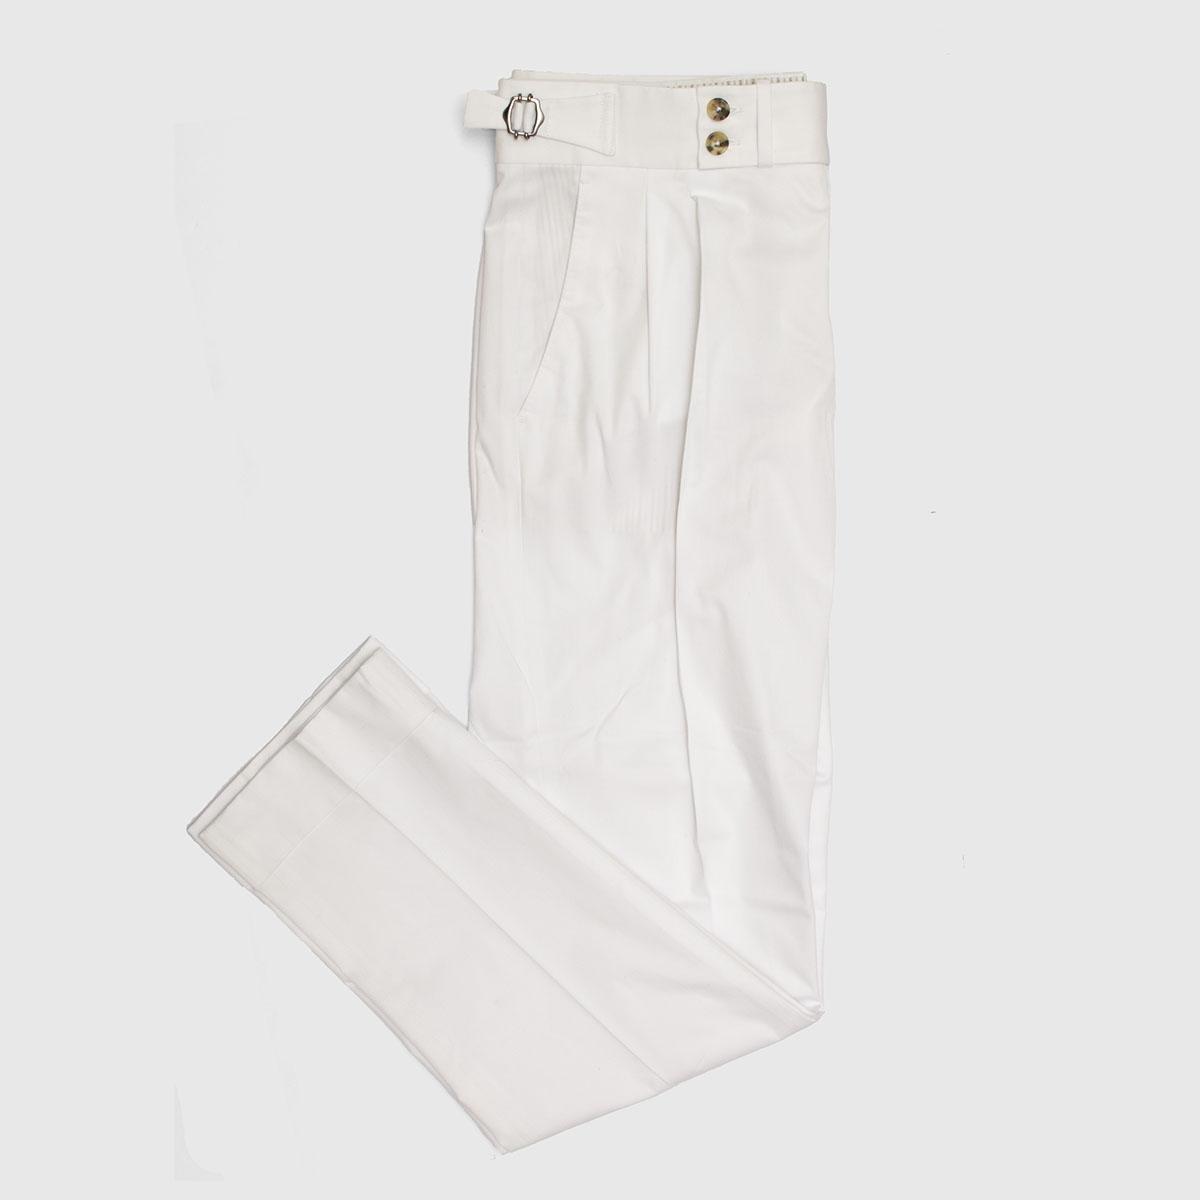 Two piences White Cotton Trousers